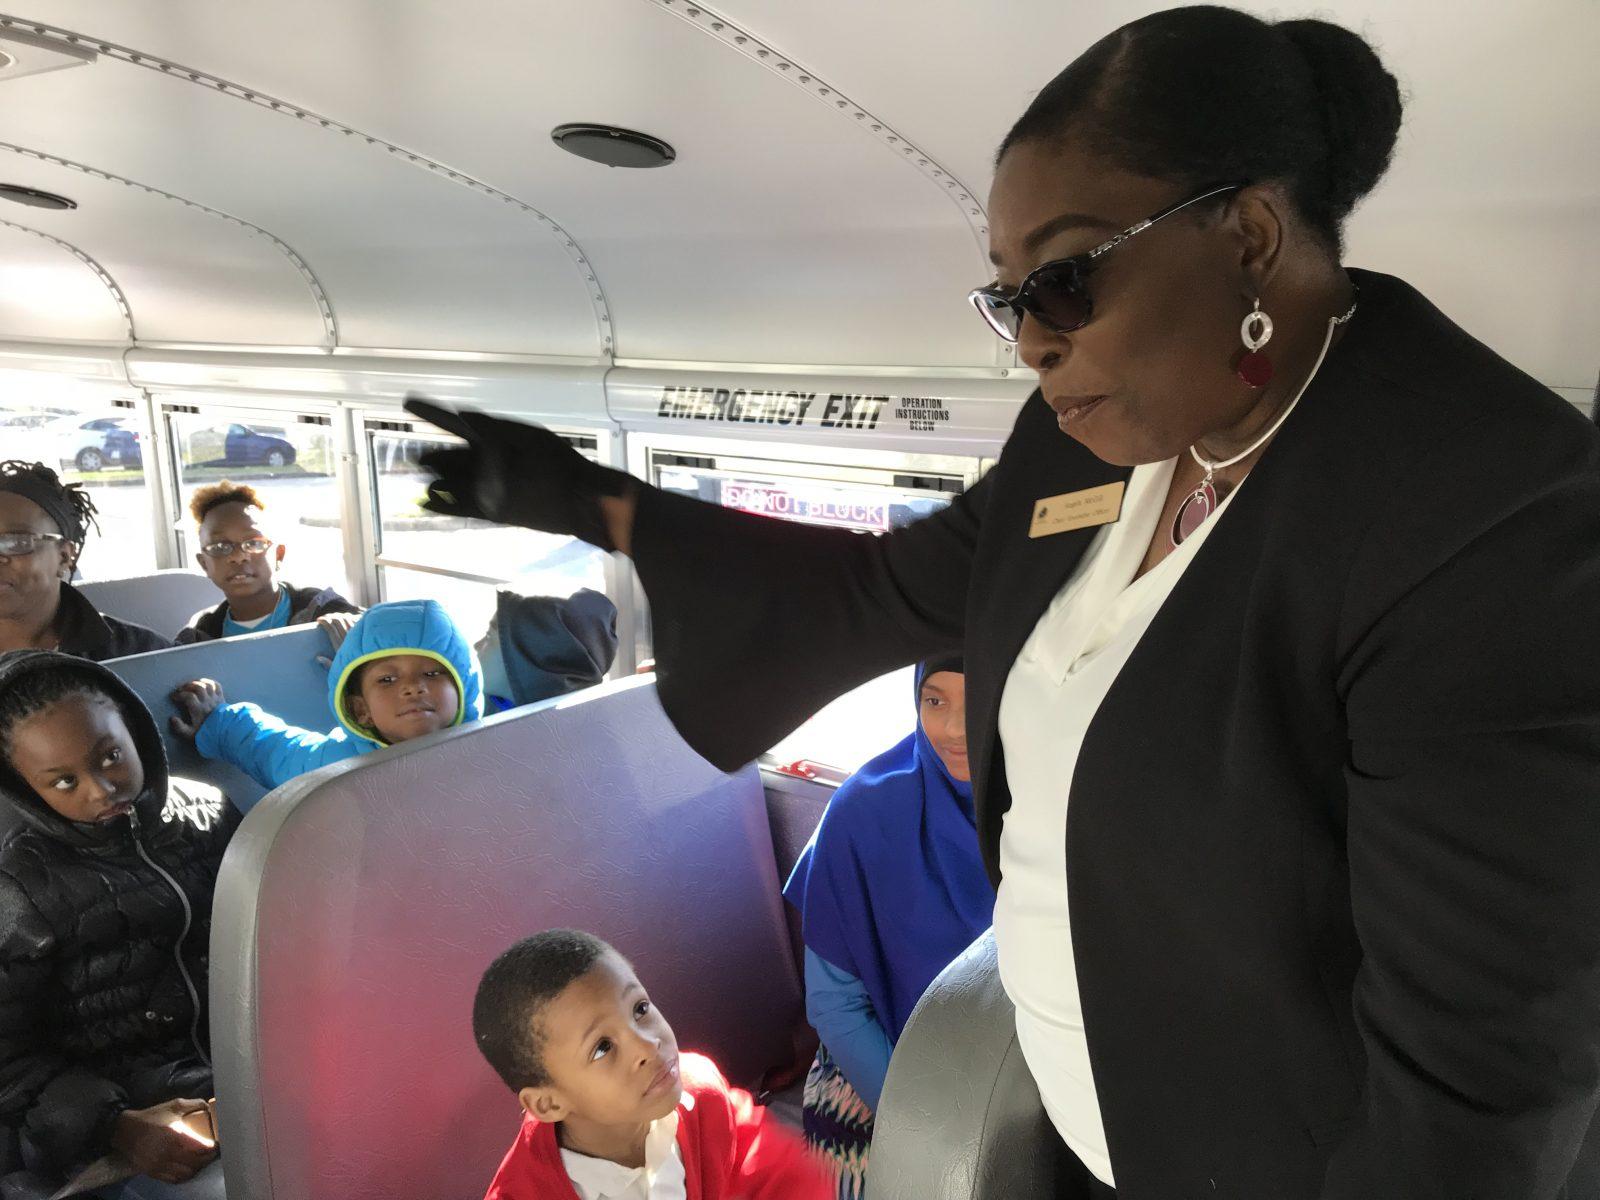 Angela McGill on donated bus.